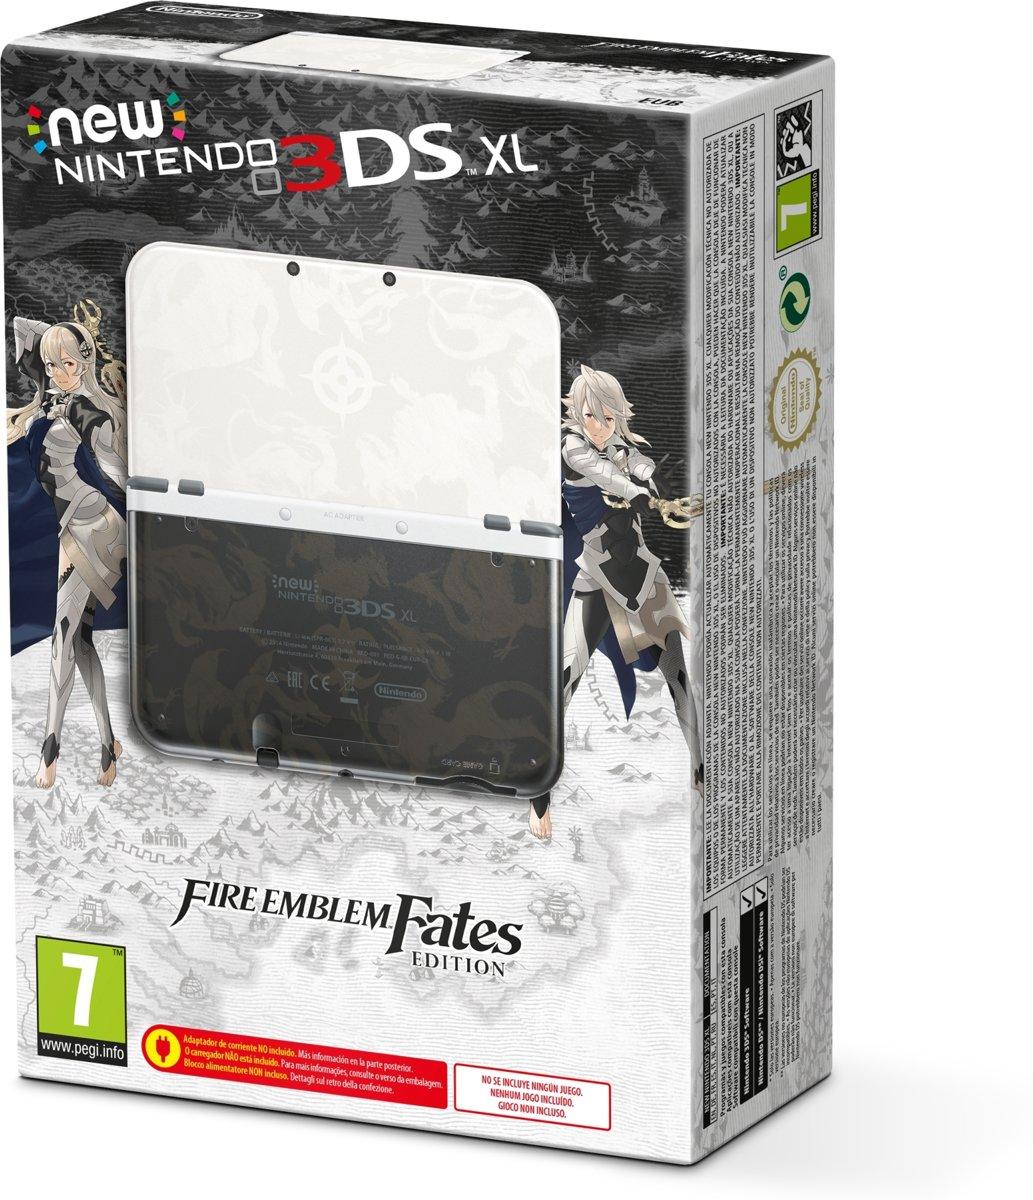 NEW Nintendo 3DS XL - Fire Emblem Fates Edition kopen